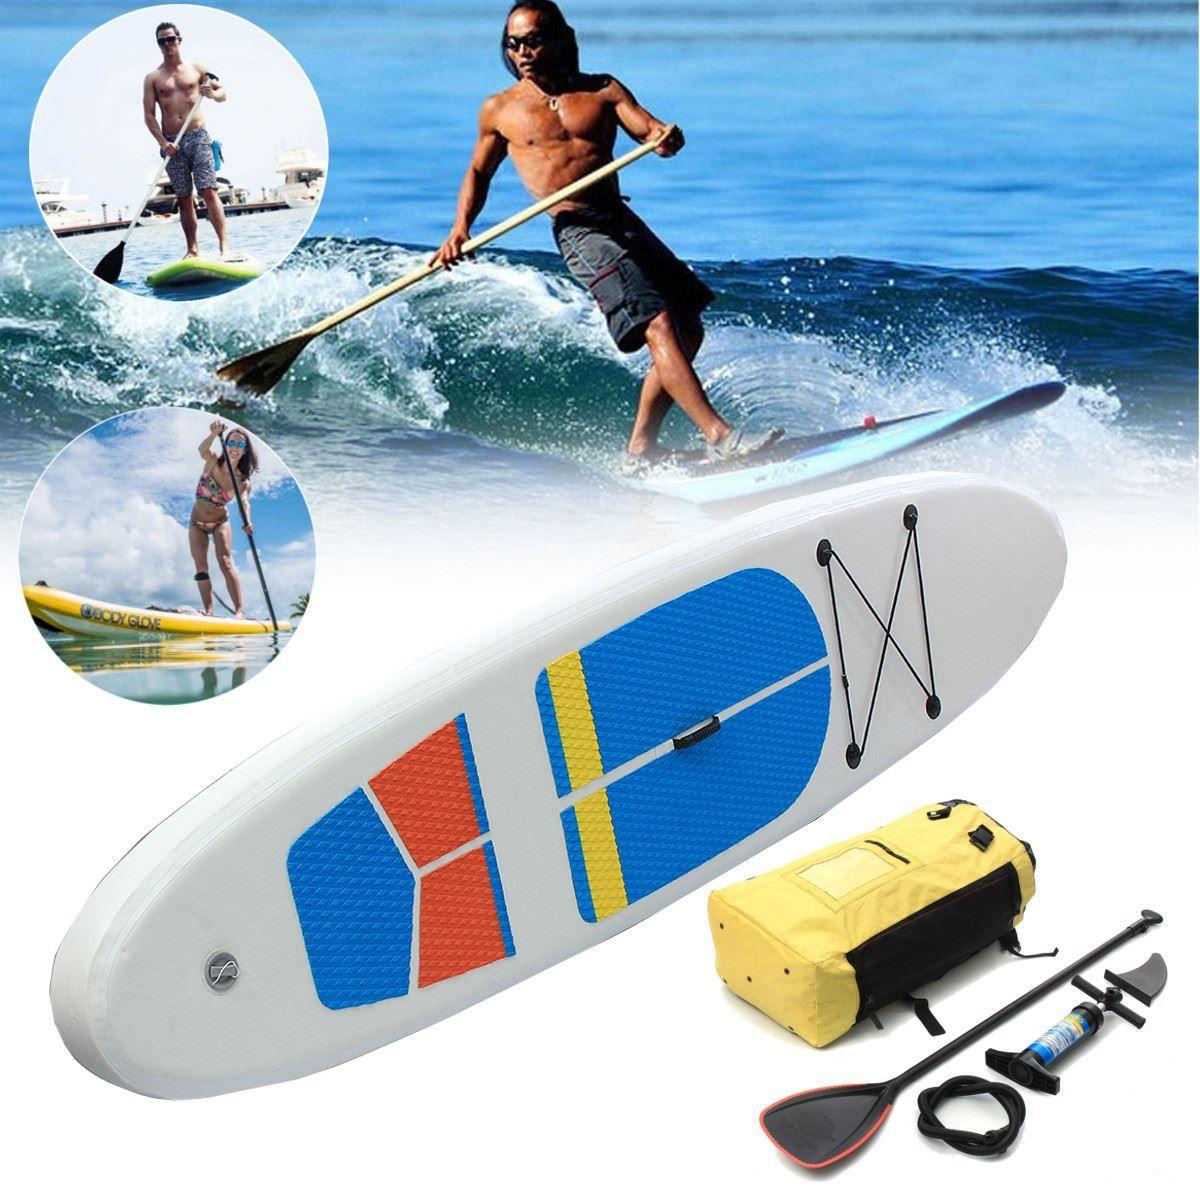 Gofun hergestellt 330*81*10 cm Stand Up Paddle Surfbrett Aufblasbare Bord SUP Set W ave Reiter + Pumpe aufblasbare surf board paddel boot